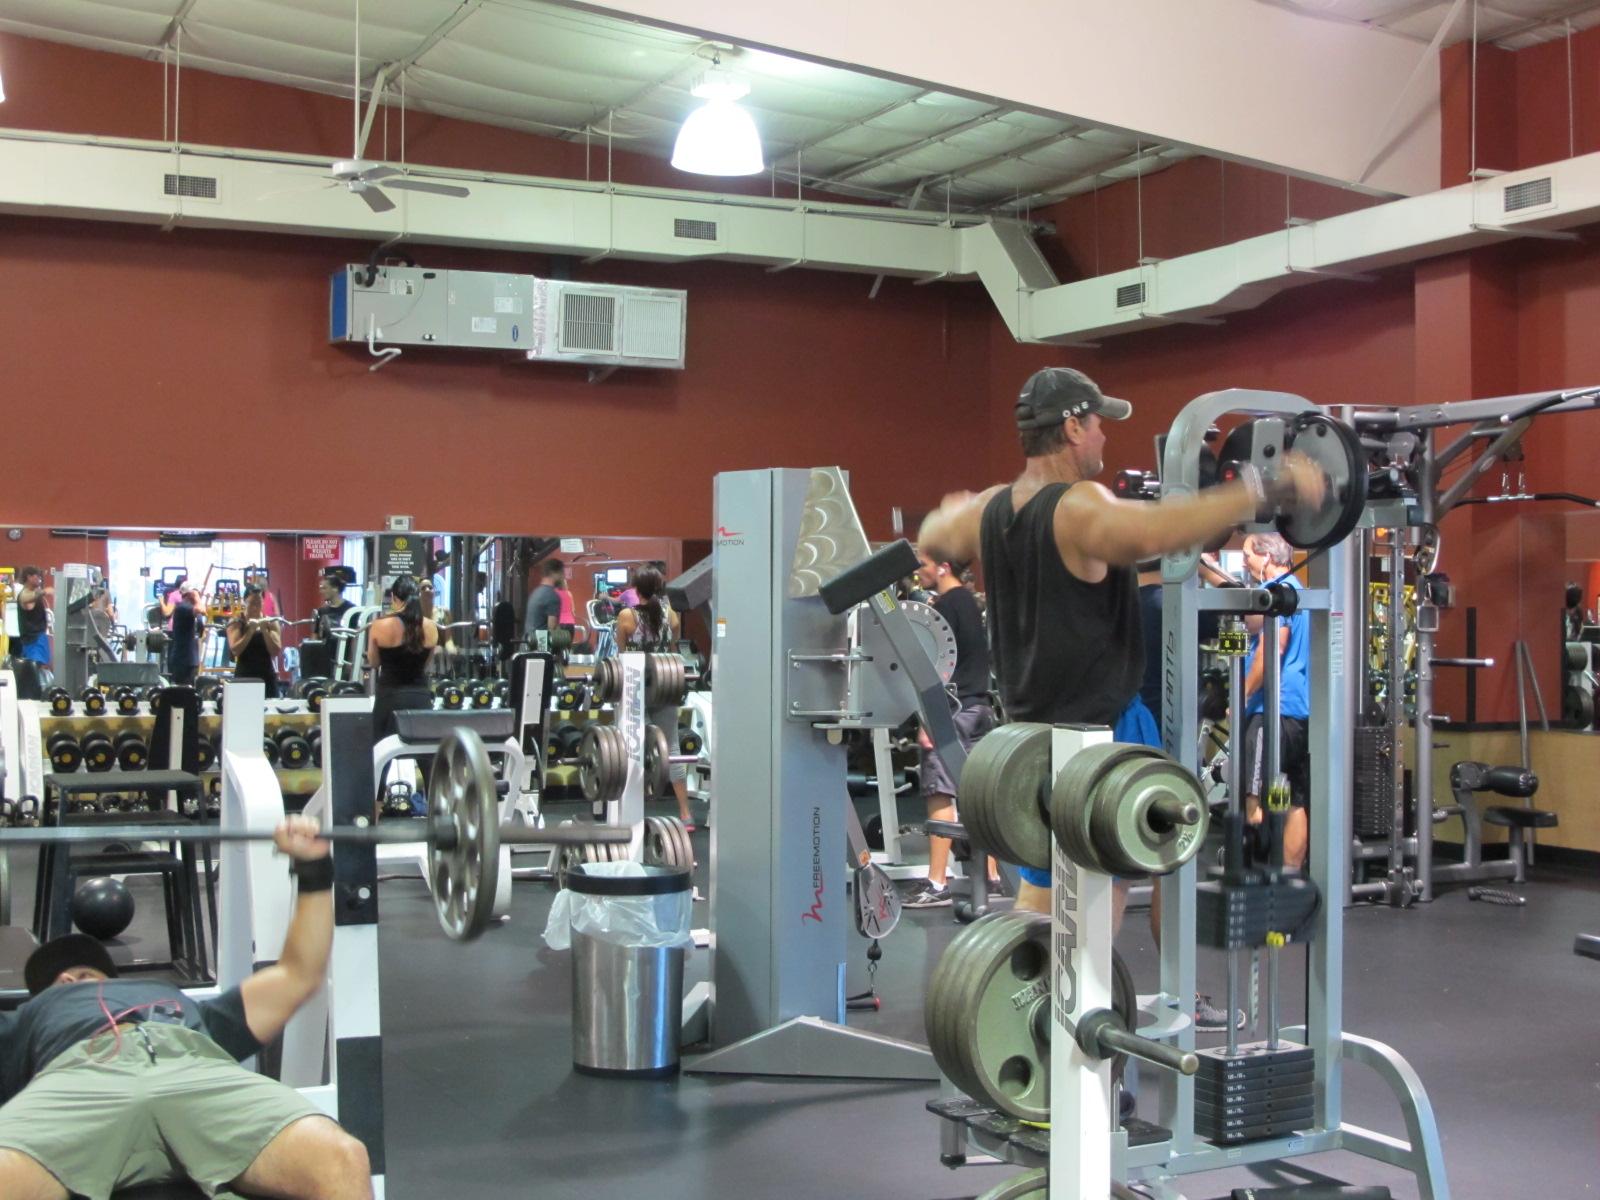 Gold S Gym Santa Rosa Beach Florida